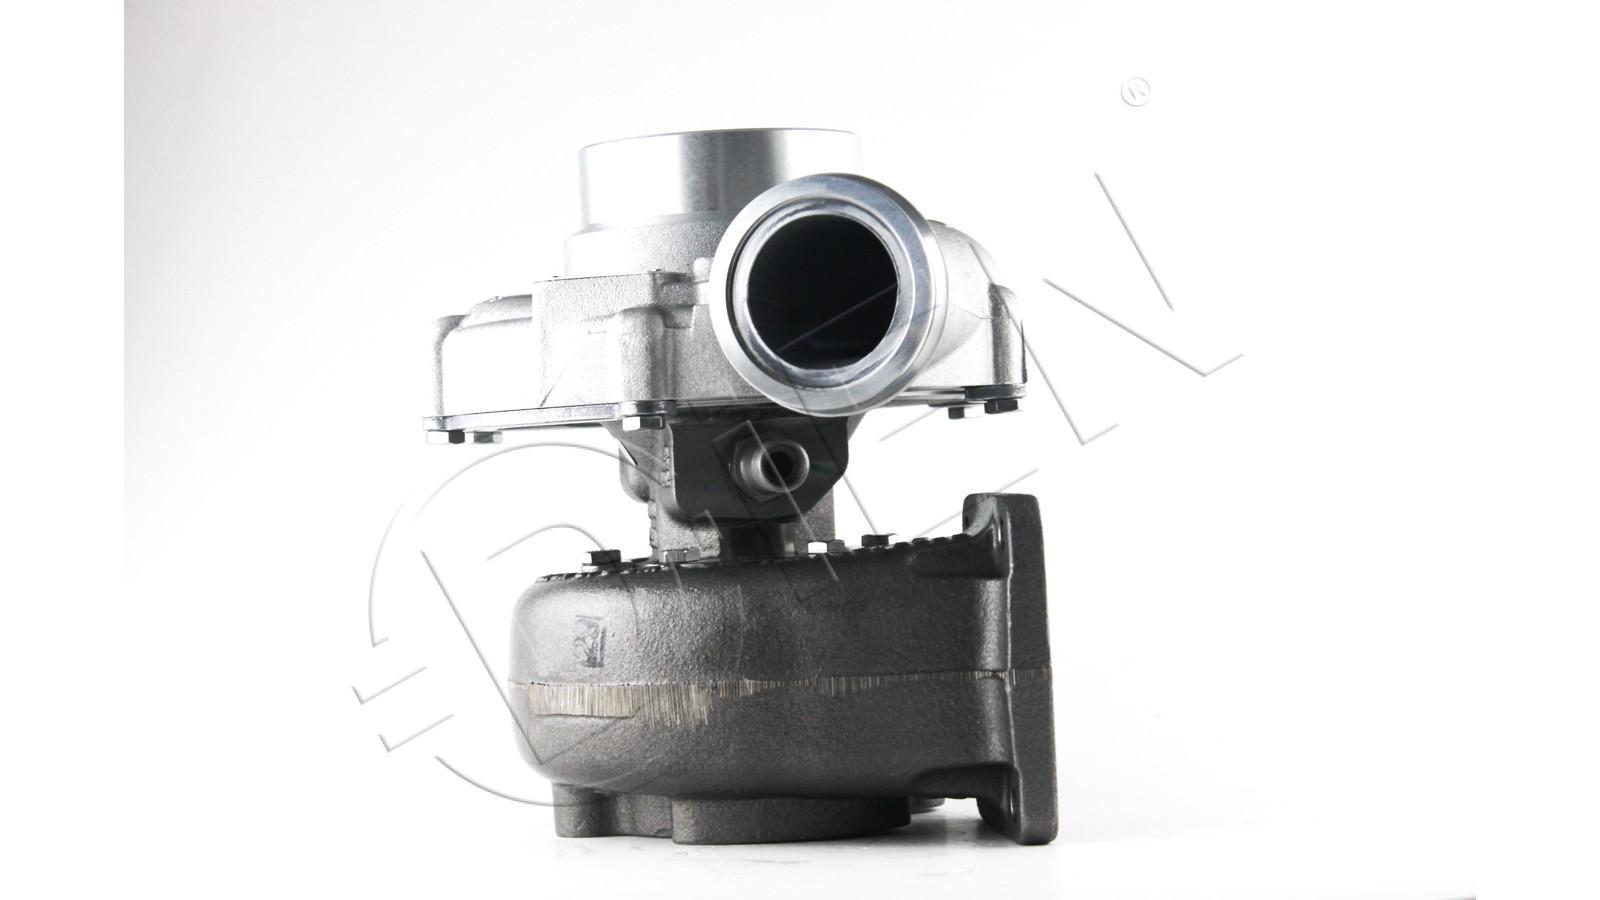 Turbocompressore rigenerato per MAN TGS 26.440 FDAC, FDALC, FDHLC, FDHLC/M 440Cv